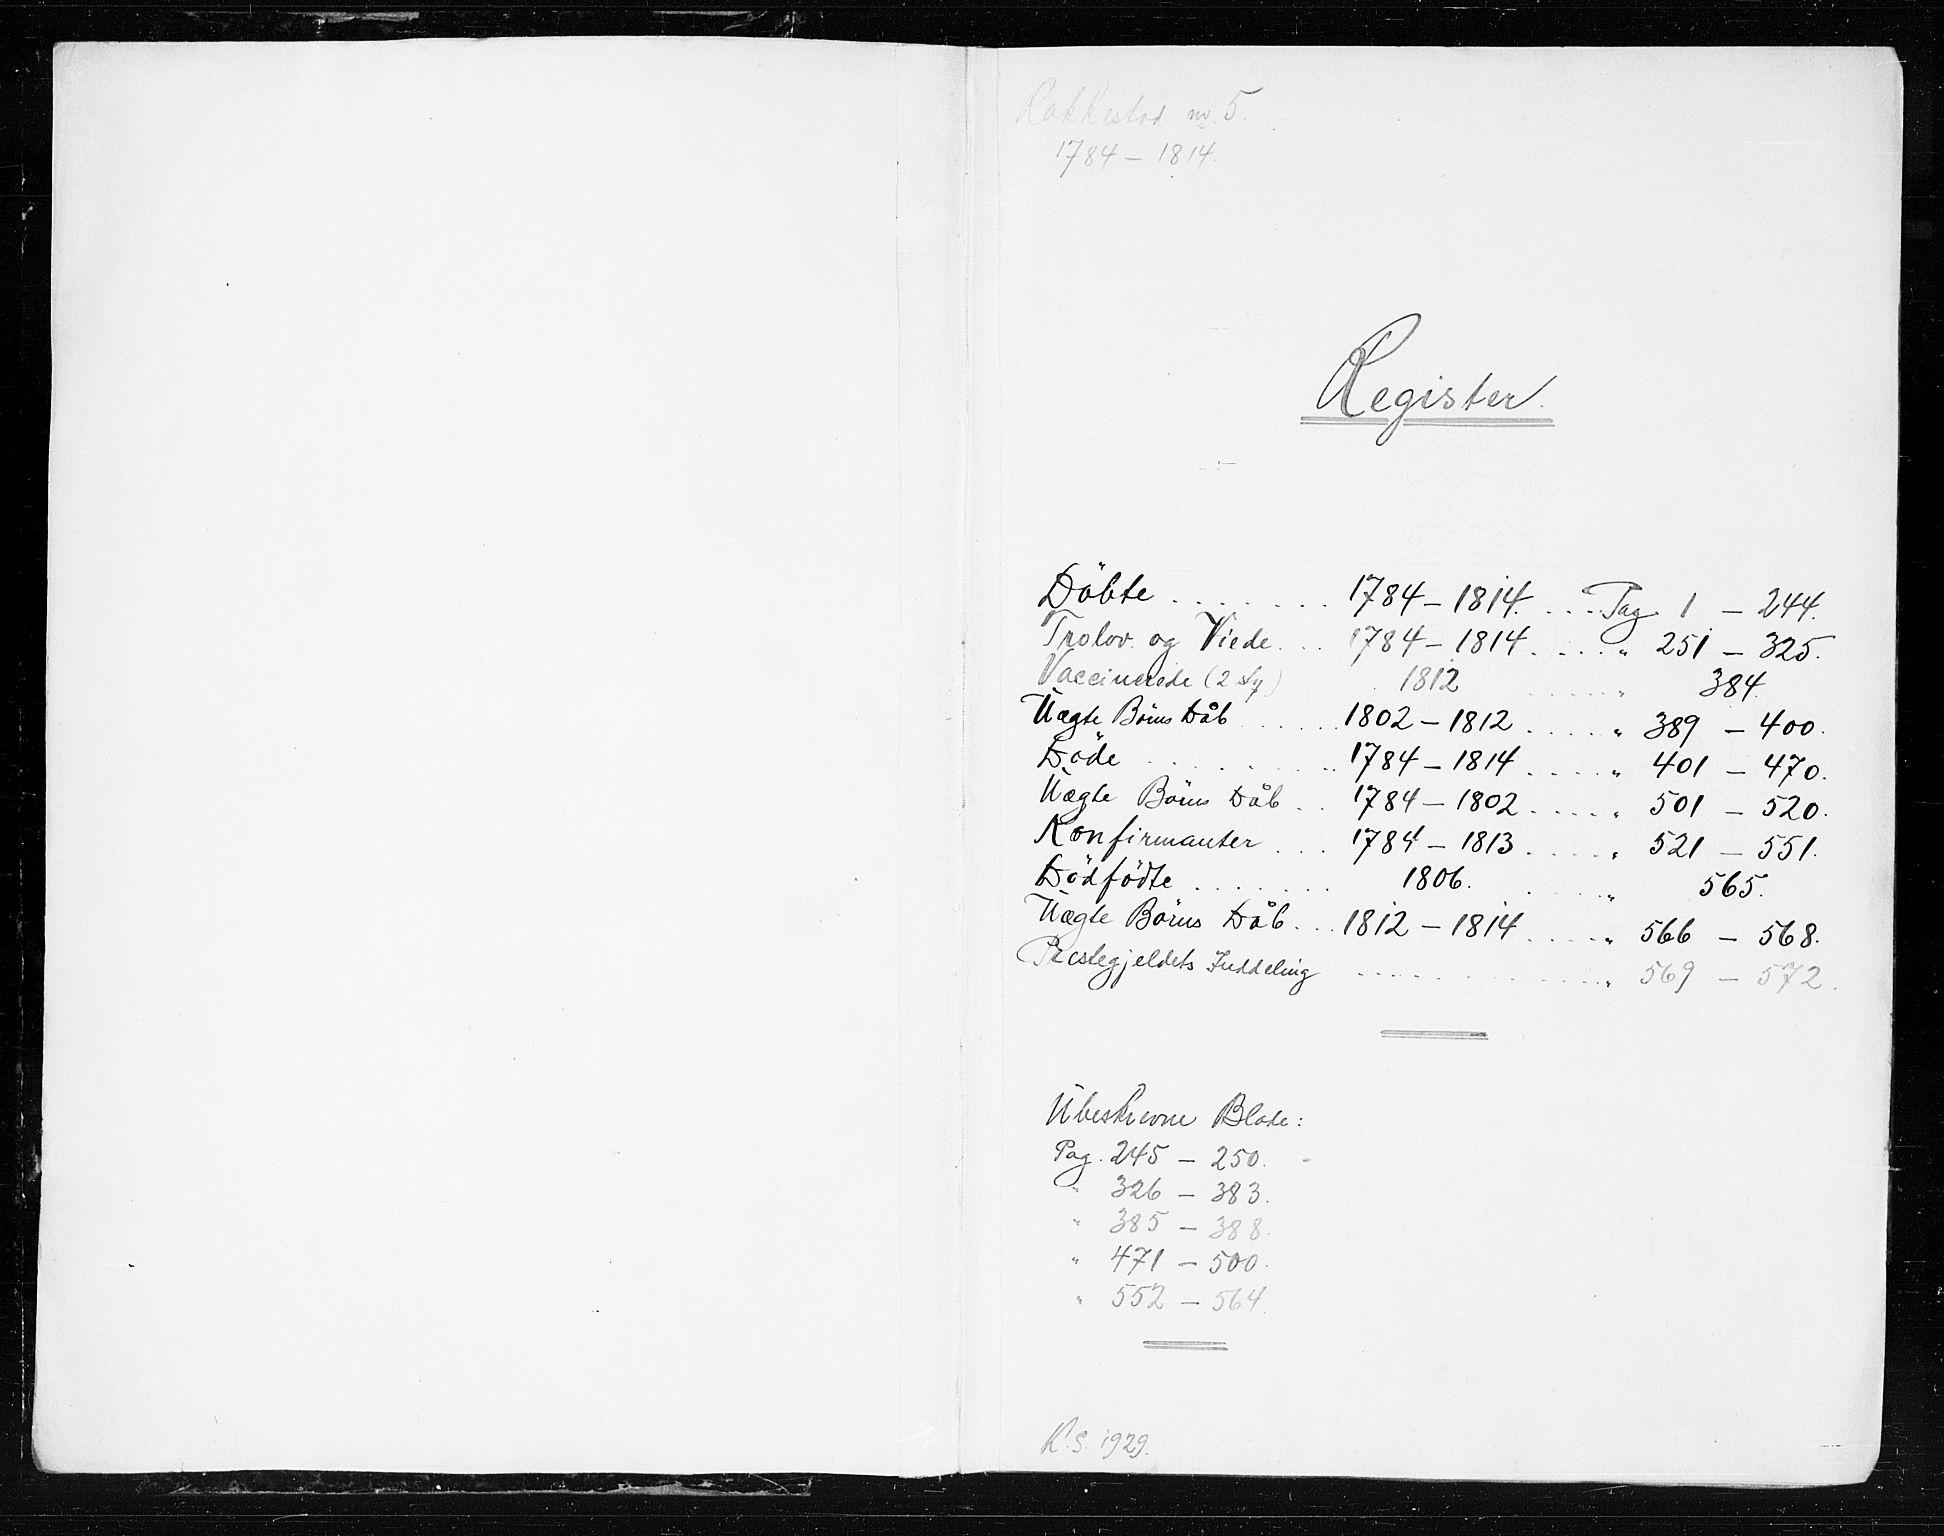 SAO, Rakkestad prestekontor Kirkebøker, F/Fa/L0005: Ministerialbok nr. I 5, 1784-1814